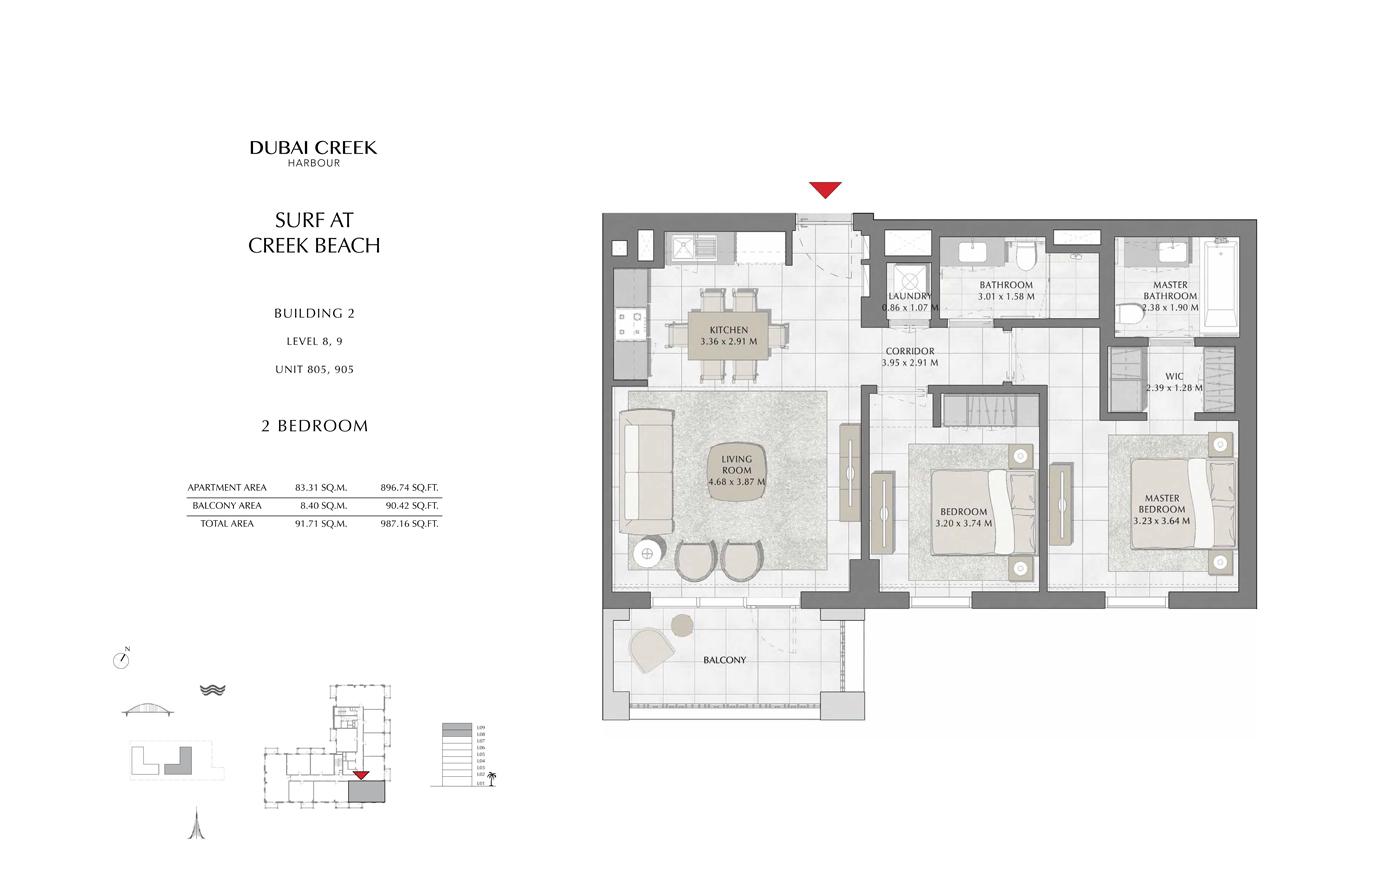 Building 2, 2 Bedroom Level 8, 9, Size 987 Sq Ft